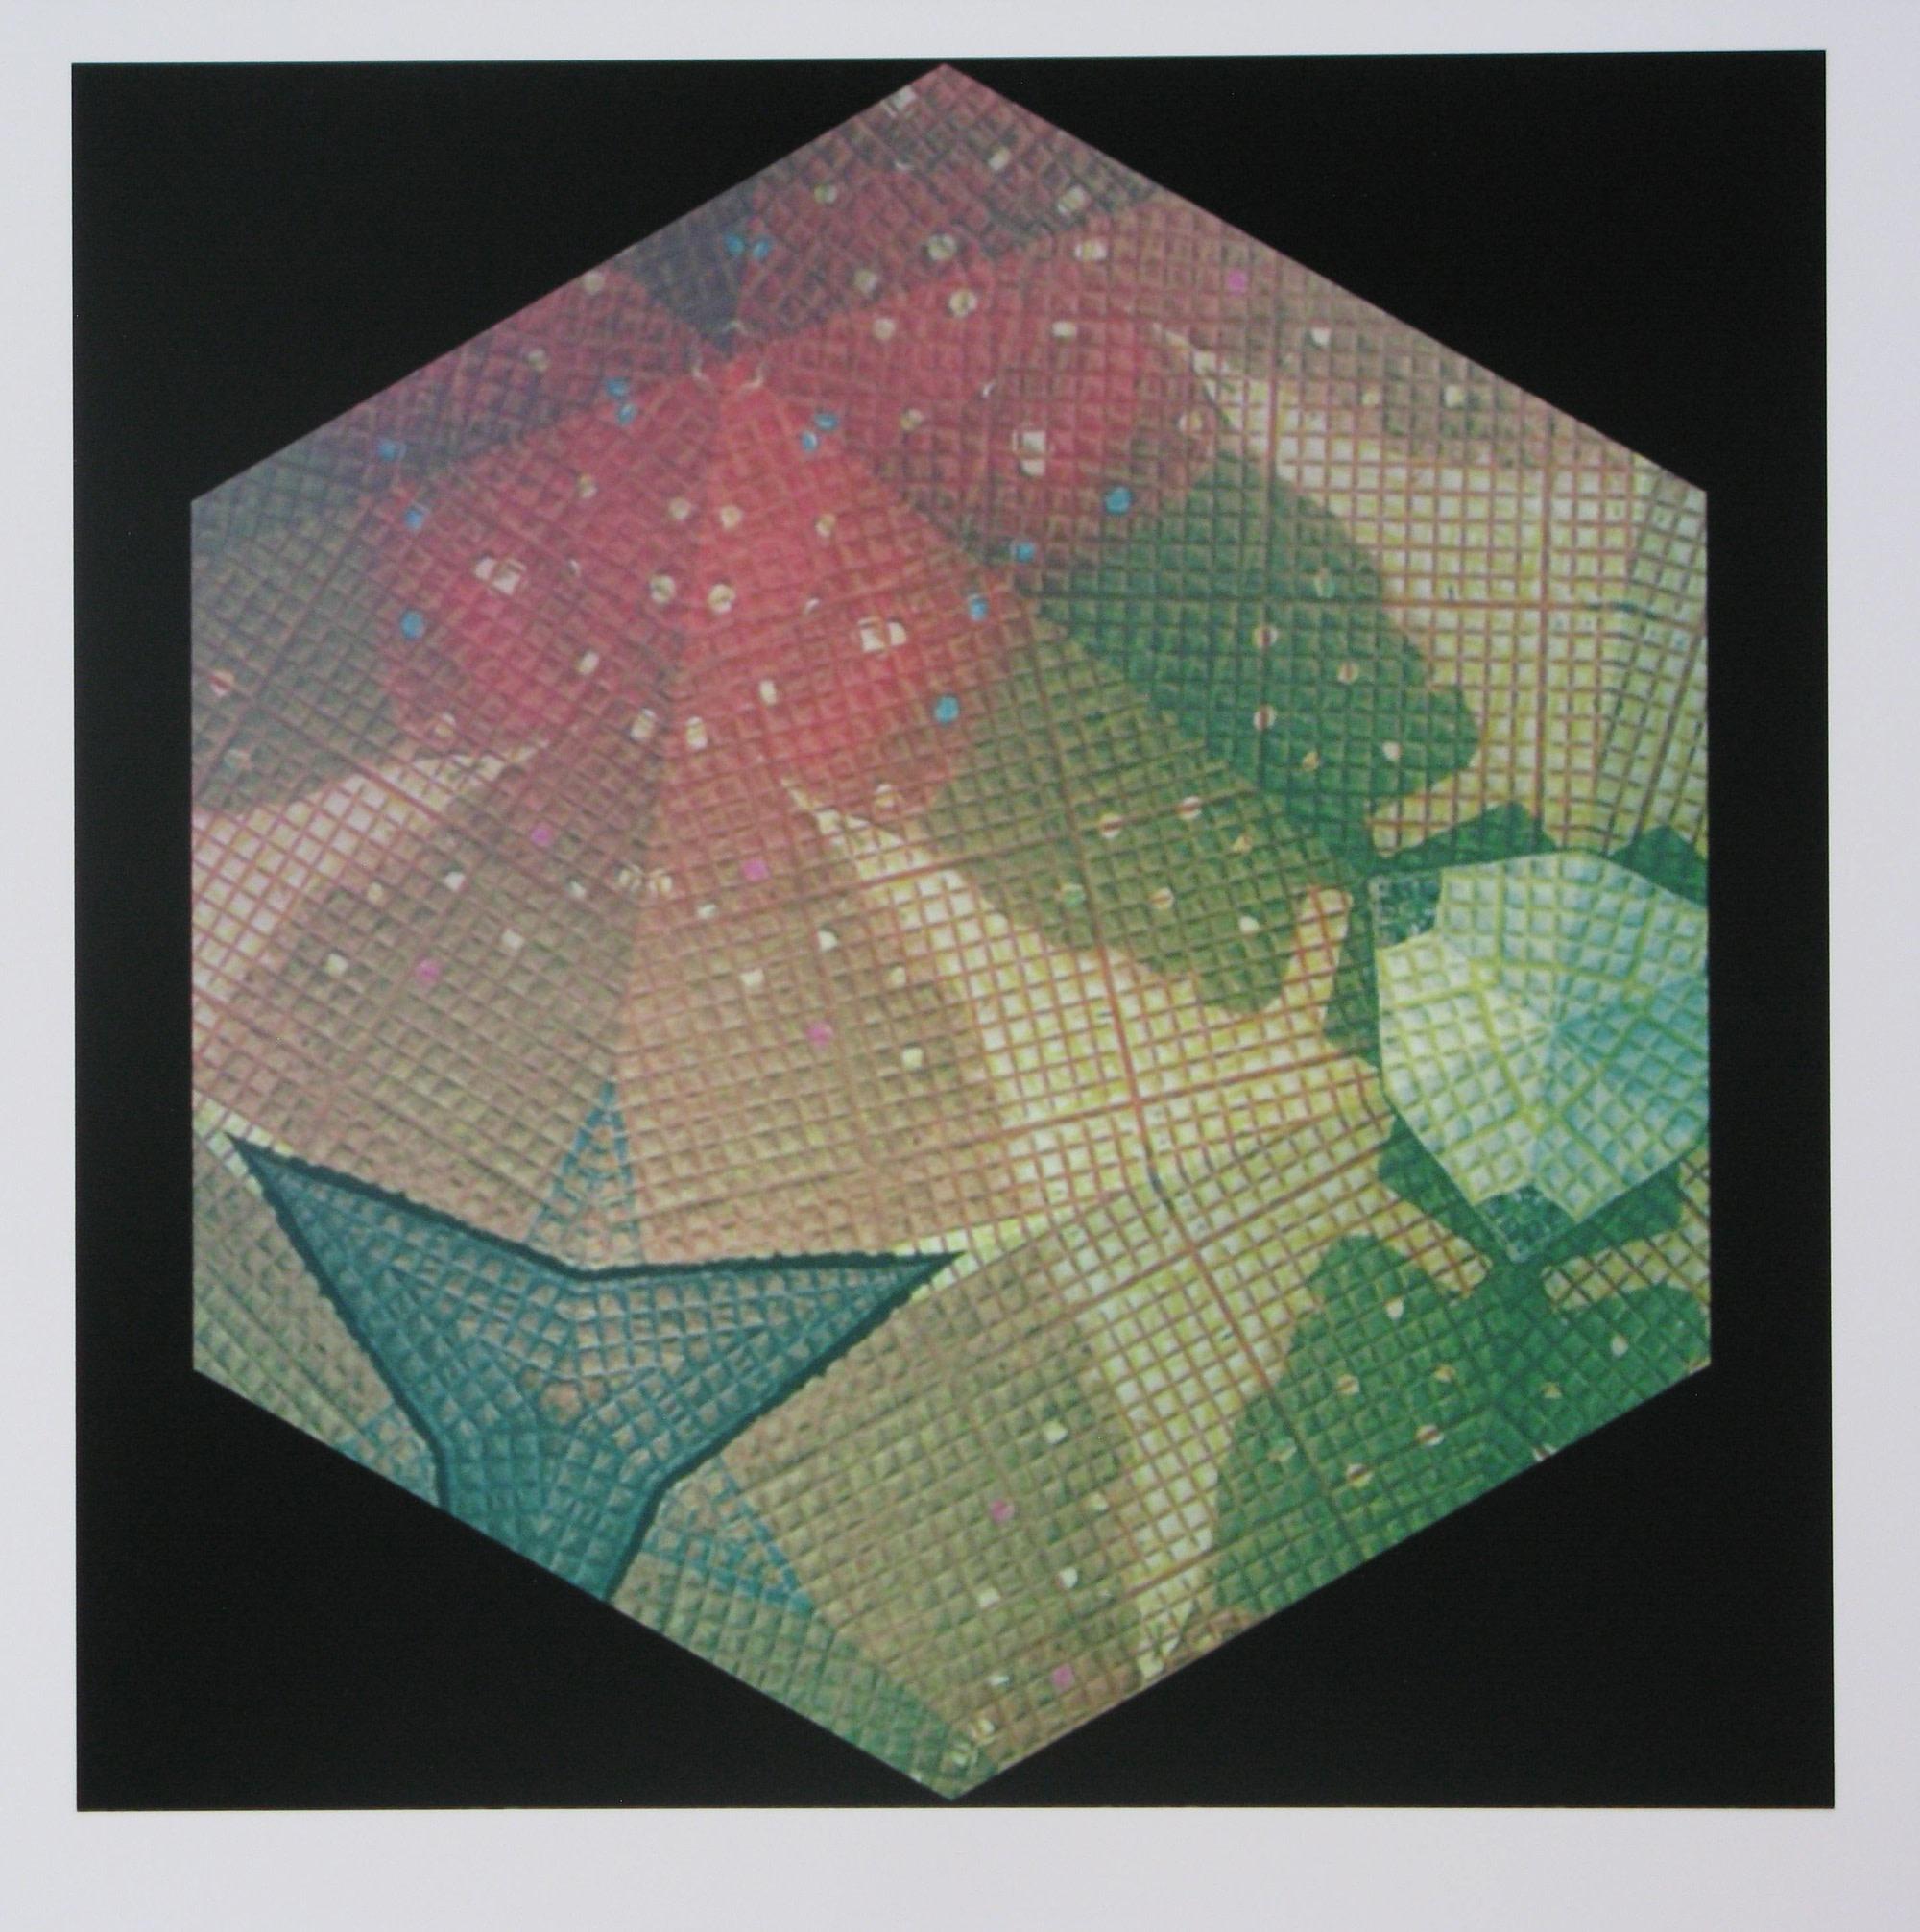 "<span class=""link fancybox-details-link""><a href=""/artists/68-peter-ford-re/works/11216/"">View Detail Page</a></span><div class=""artist""><span class=""artist""><strong>Peter Ford RE</strong></span></div><div class=""title""><em>Hexagon 2</em></div><div class=""medium"">archival digital print</div><div class=""dimensions"">32 x 32cm paper size<br /> 20 x 20cm image size</div><div class=""edition_details"">edition of 60</div><div class=""price"">£100.00 unframed</div>"